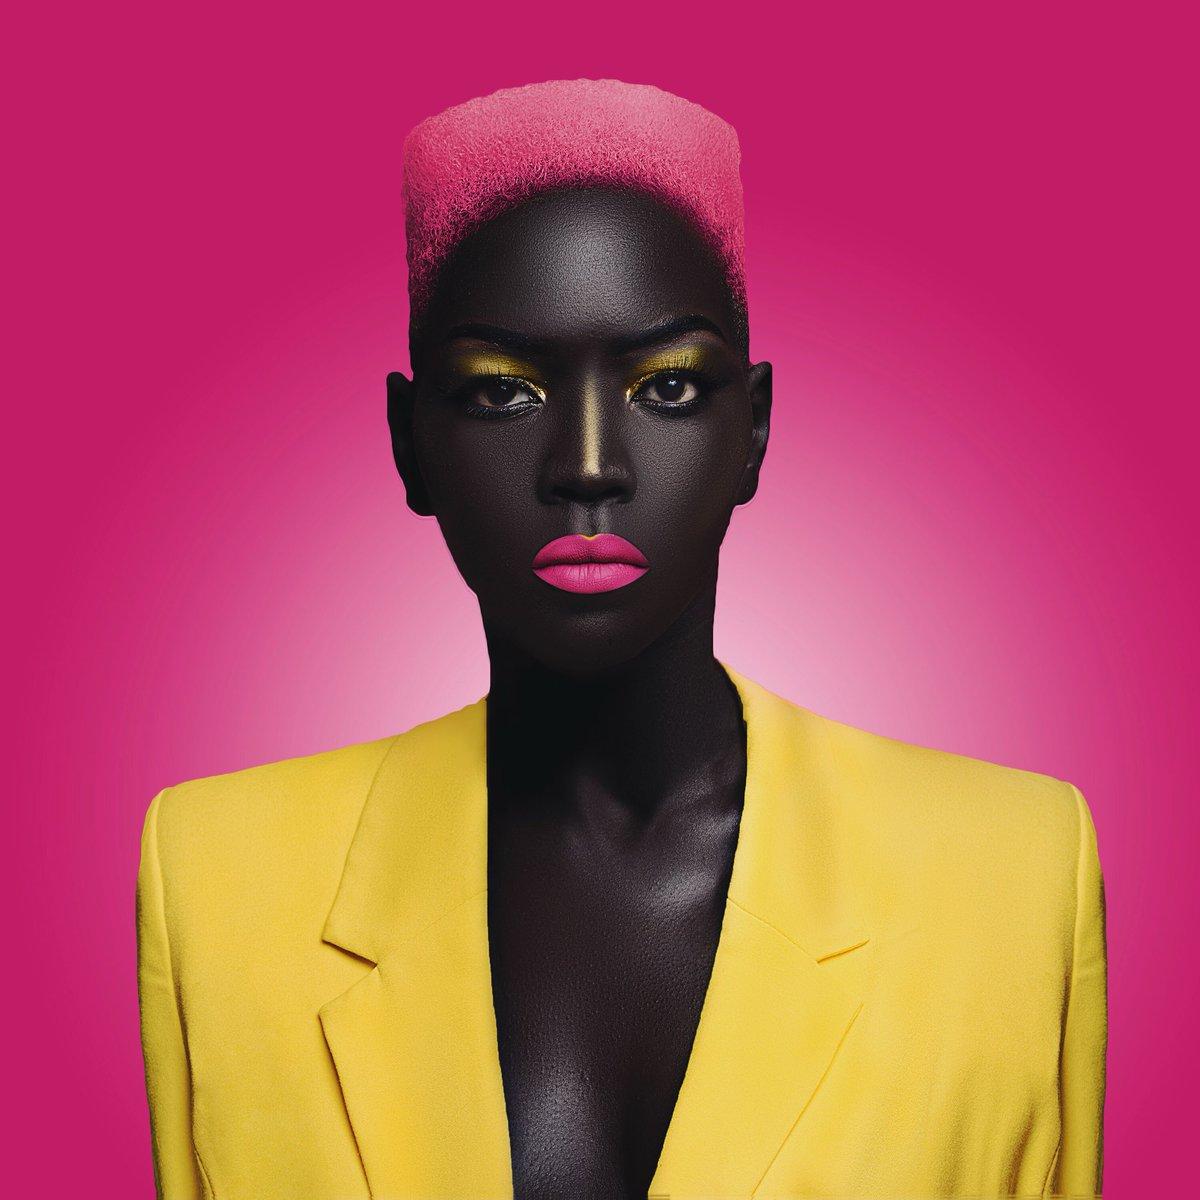 Sudanese Model Nyakim GatwechEnters Guinness Book Of Records For Having The Darkest Skin Tone On Earth